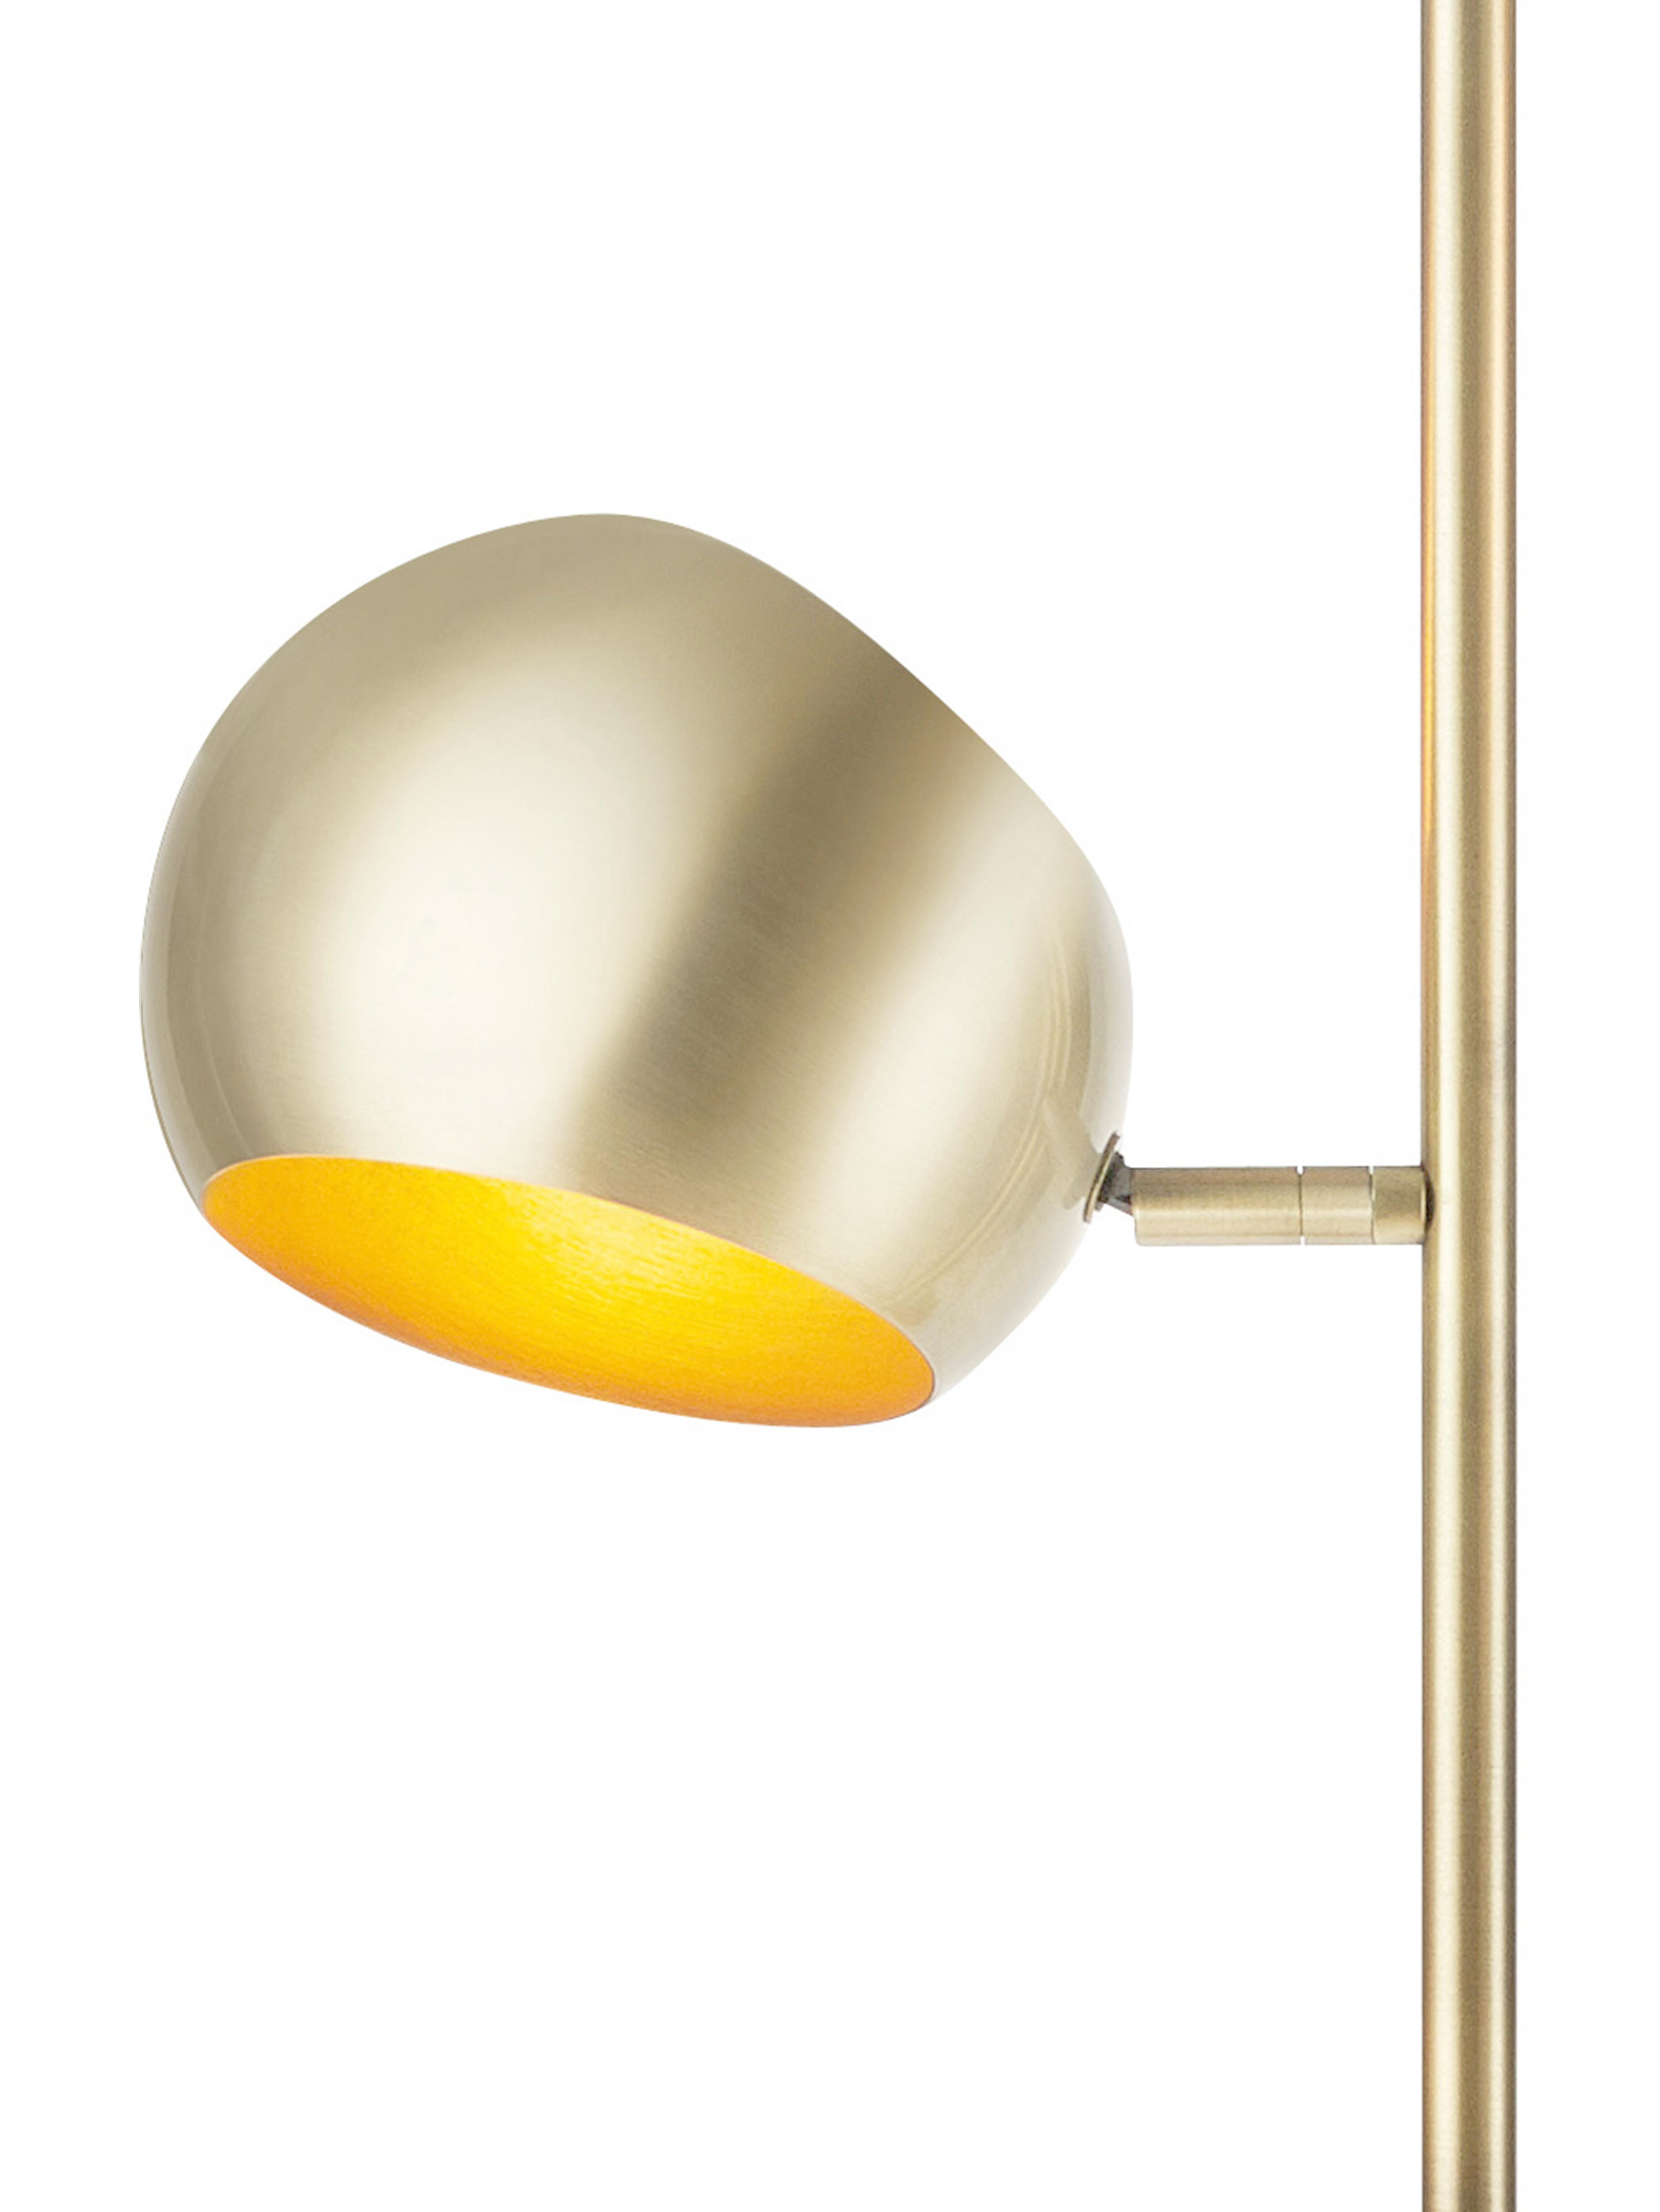 Stehlampe Edgar in Gold, Lampenschirm: Metall, lackiert, Lampenfuß: Metall, lackiert, Messingfarben mit Antik-Finish, 40 x 145 cm